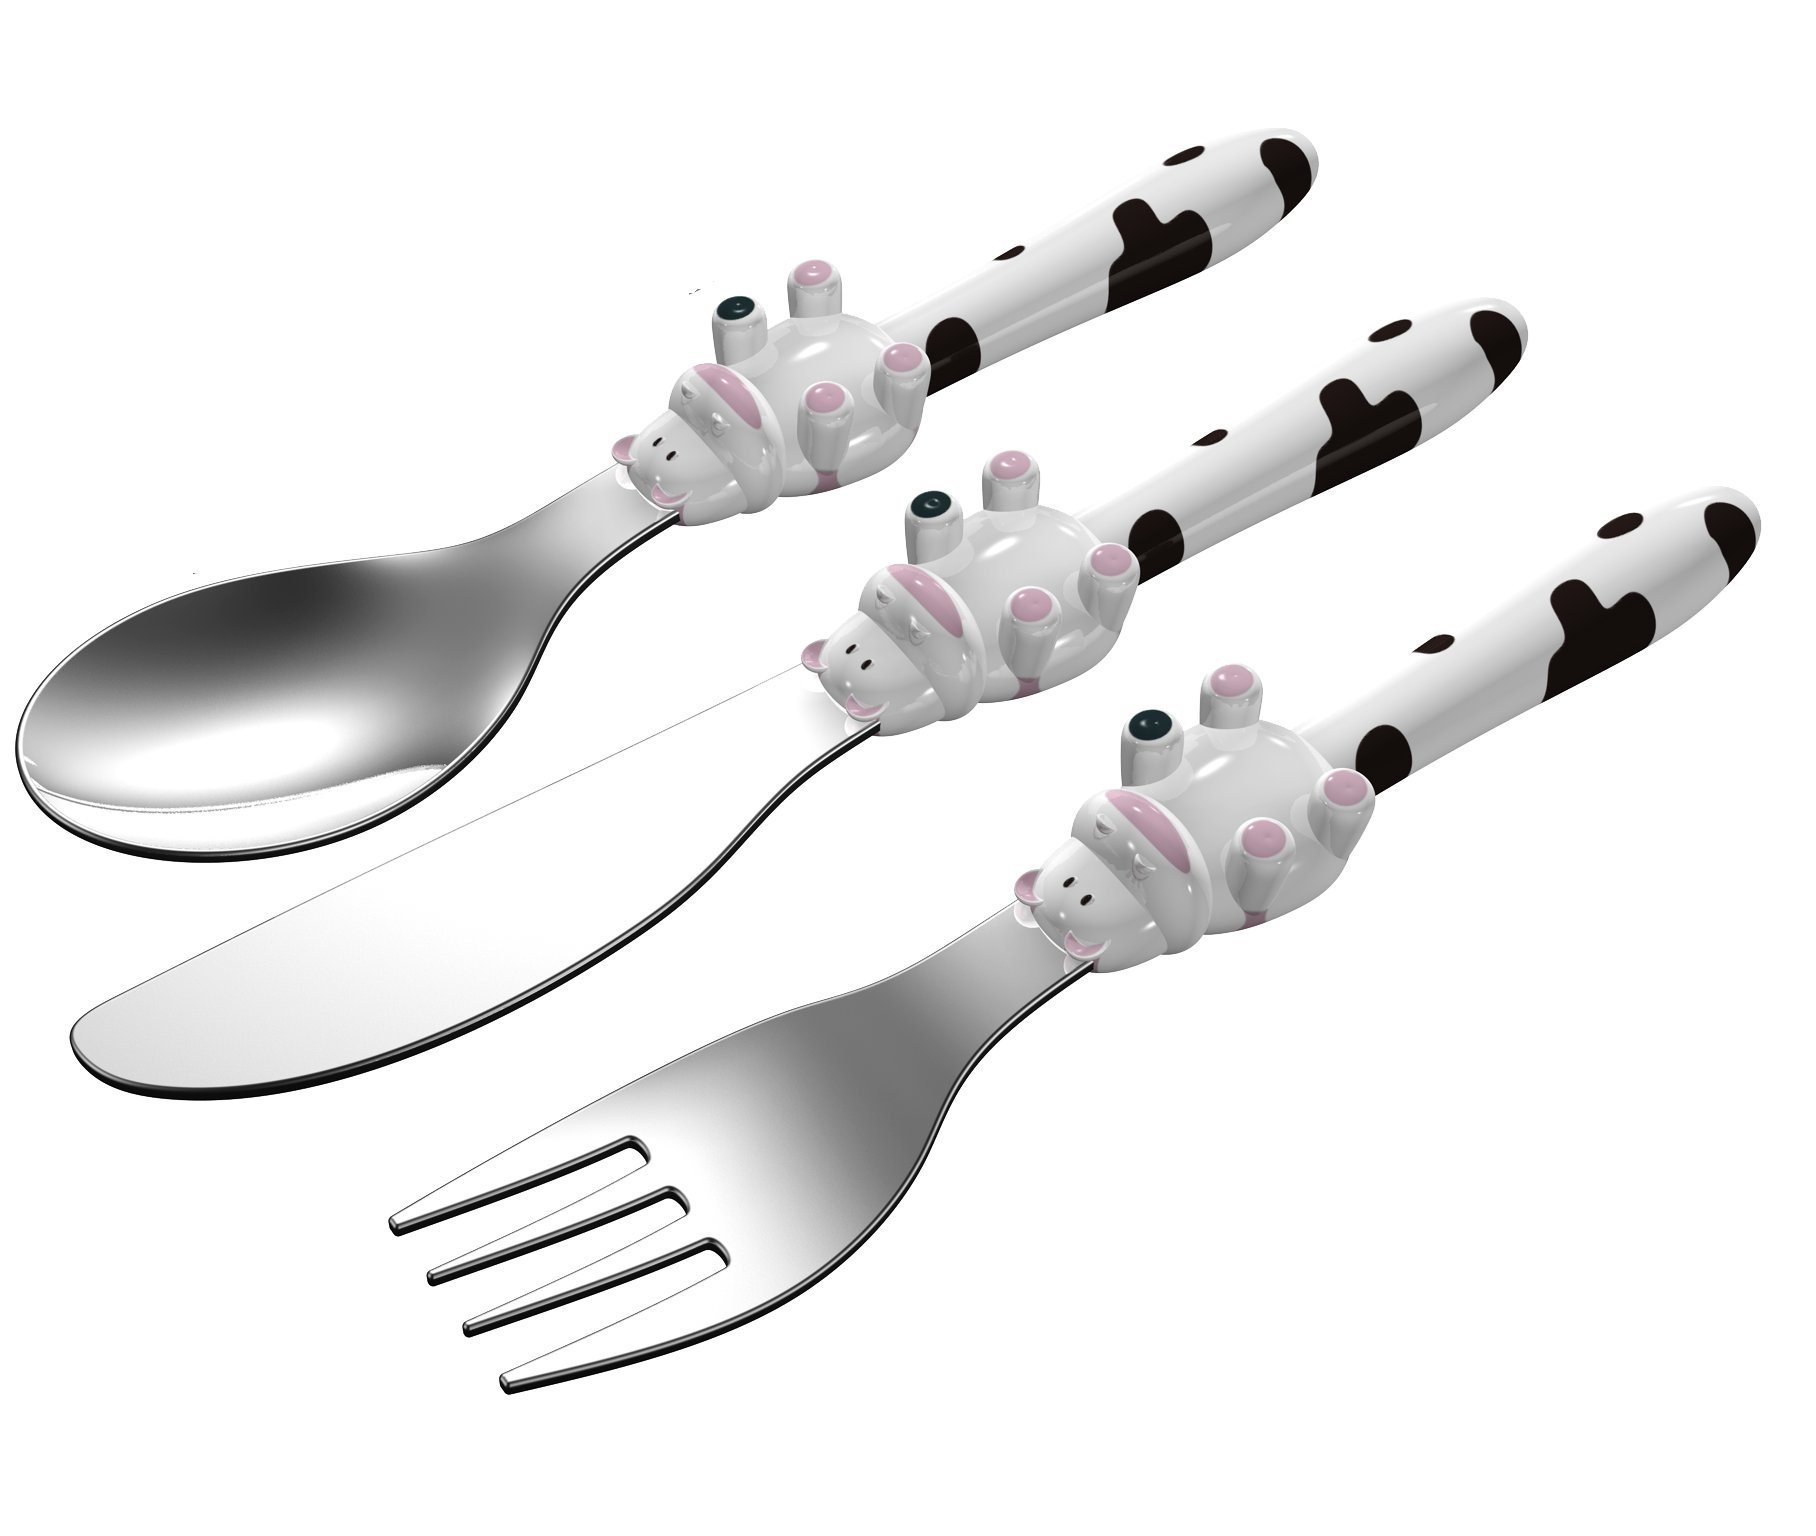 EXZACT - 3 pieza para niños cubertería - 1 x cena cuchillo, 1 x cena tenedor, 1 x cena cuchara (Vaca x 3)